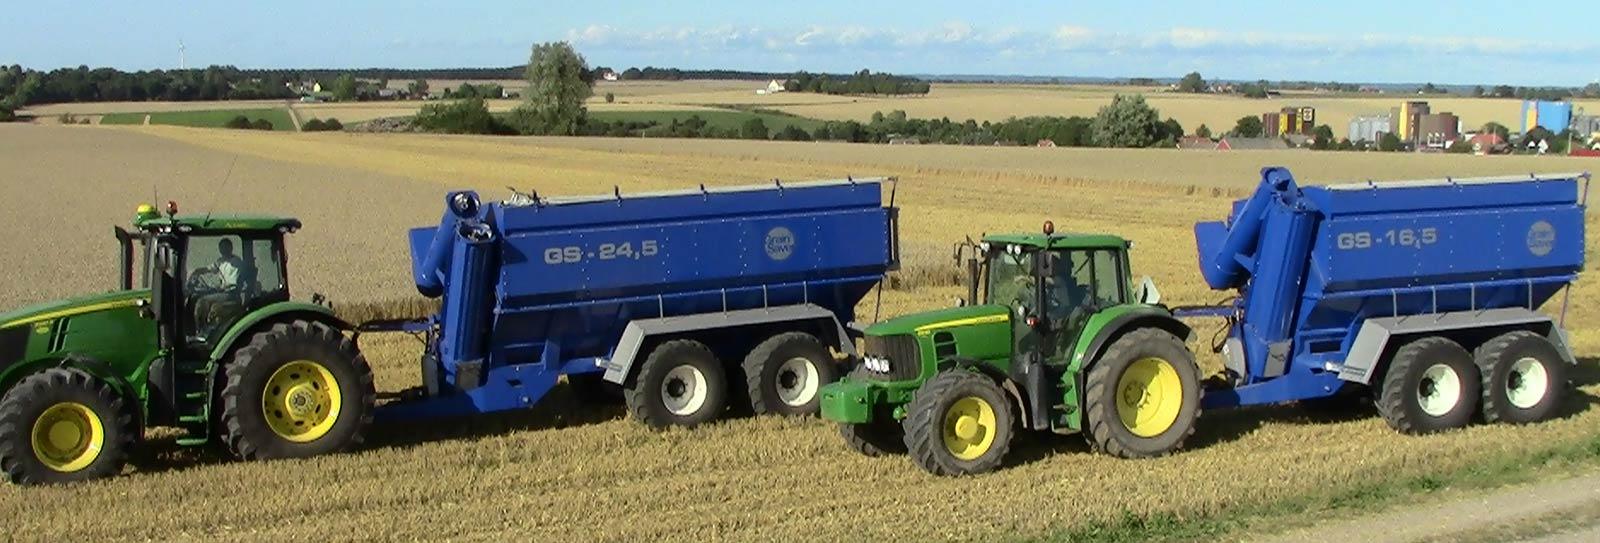 gs-16,5 gs-24 grain carts